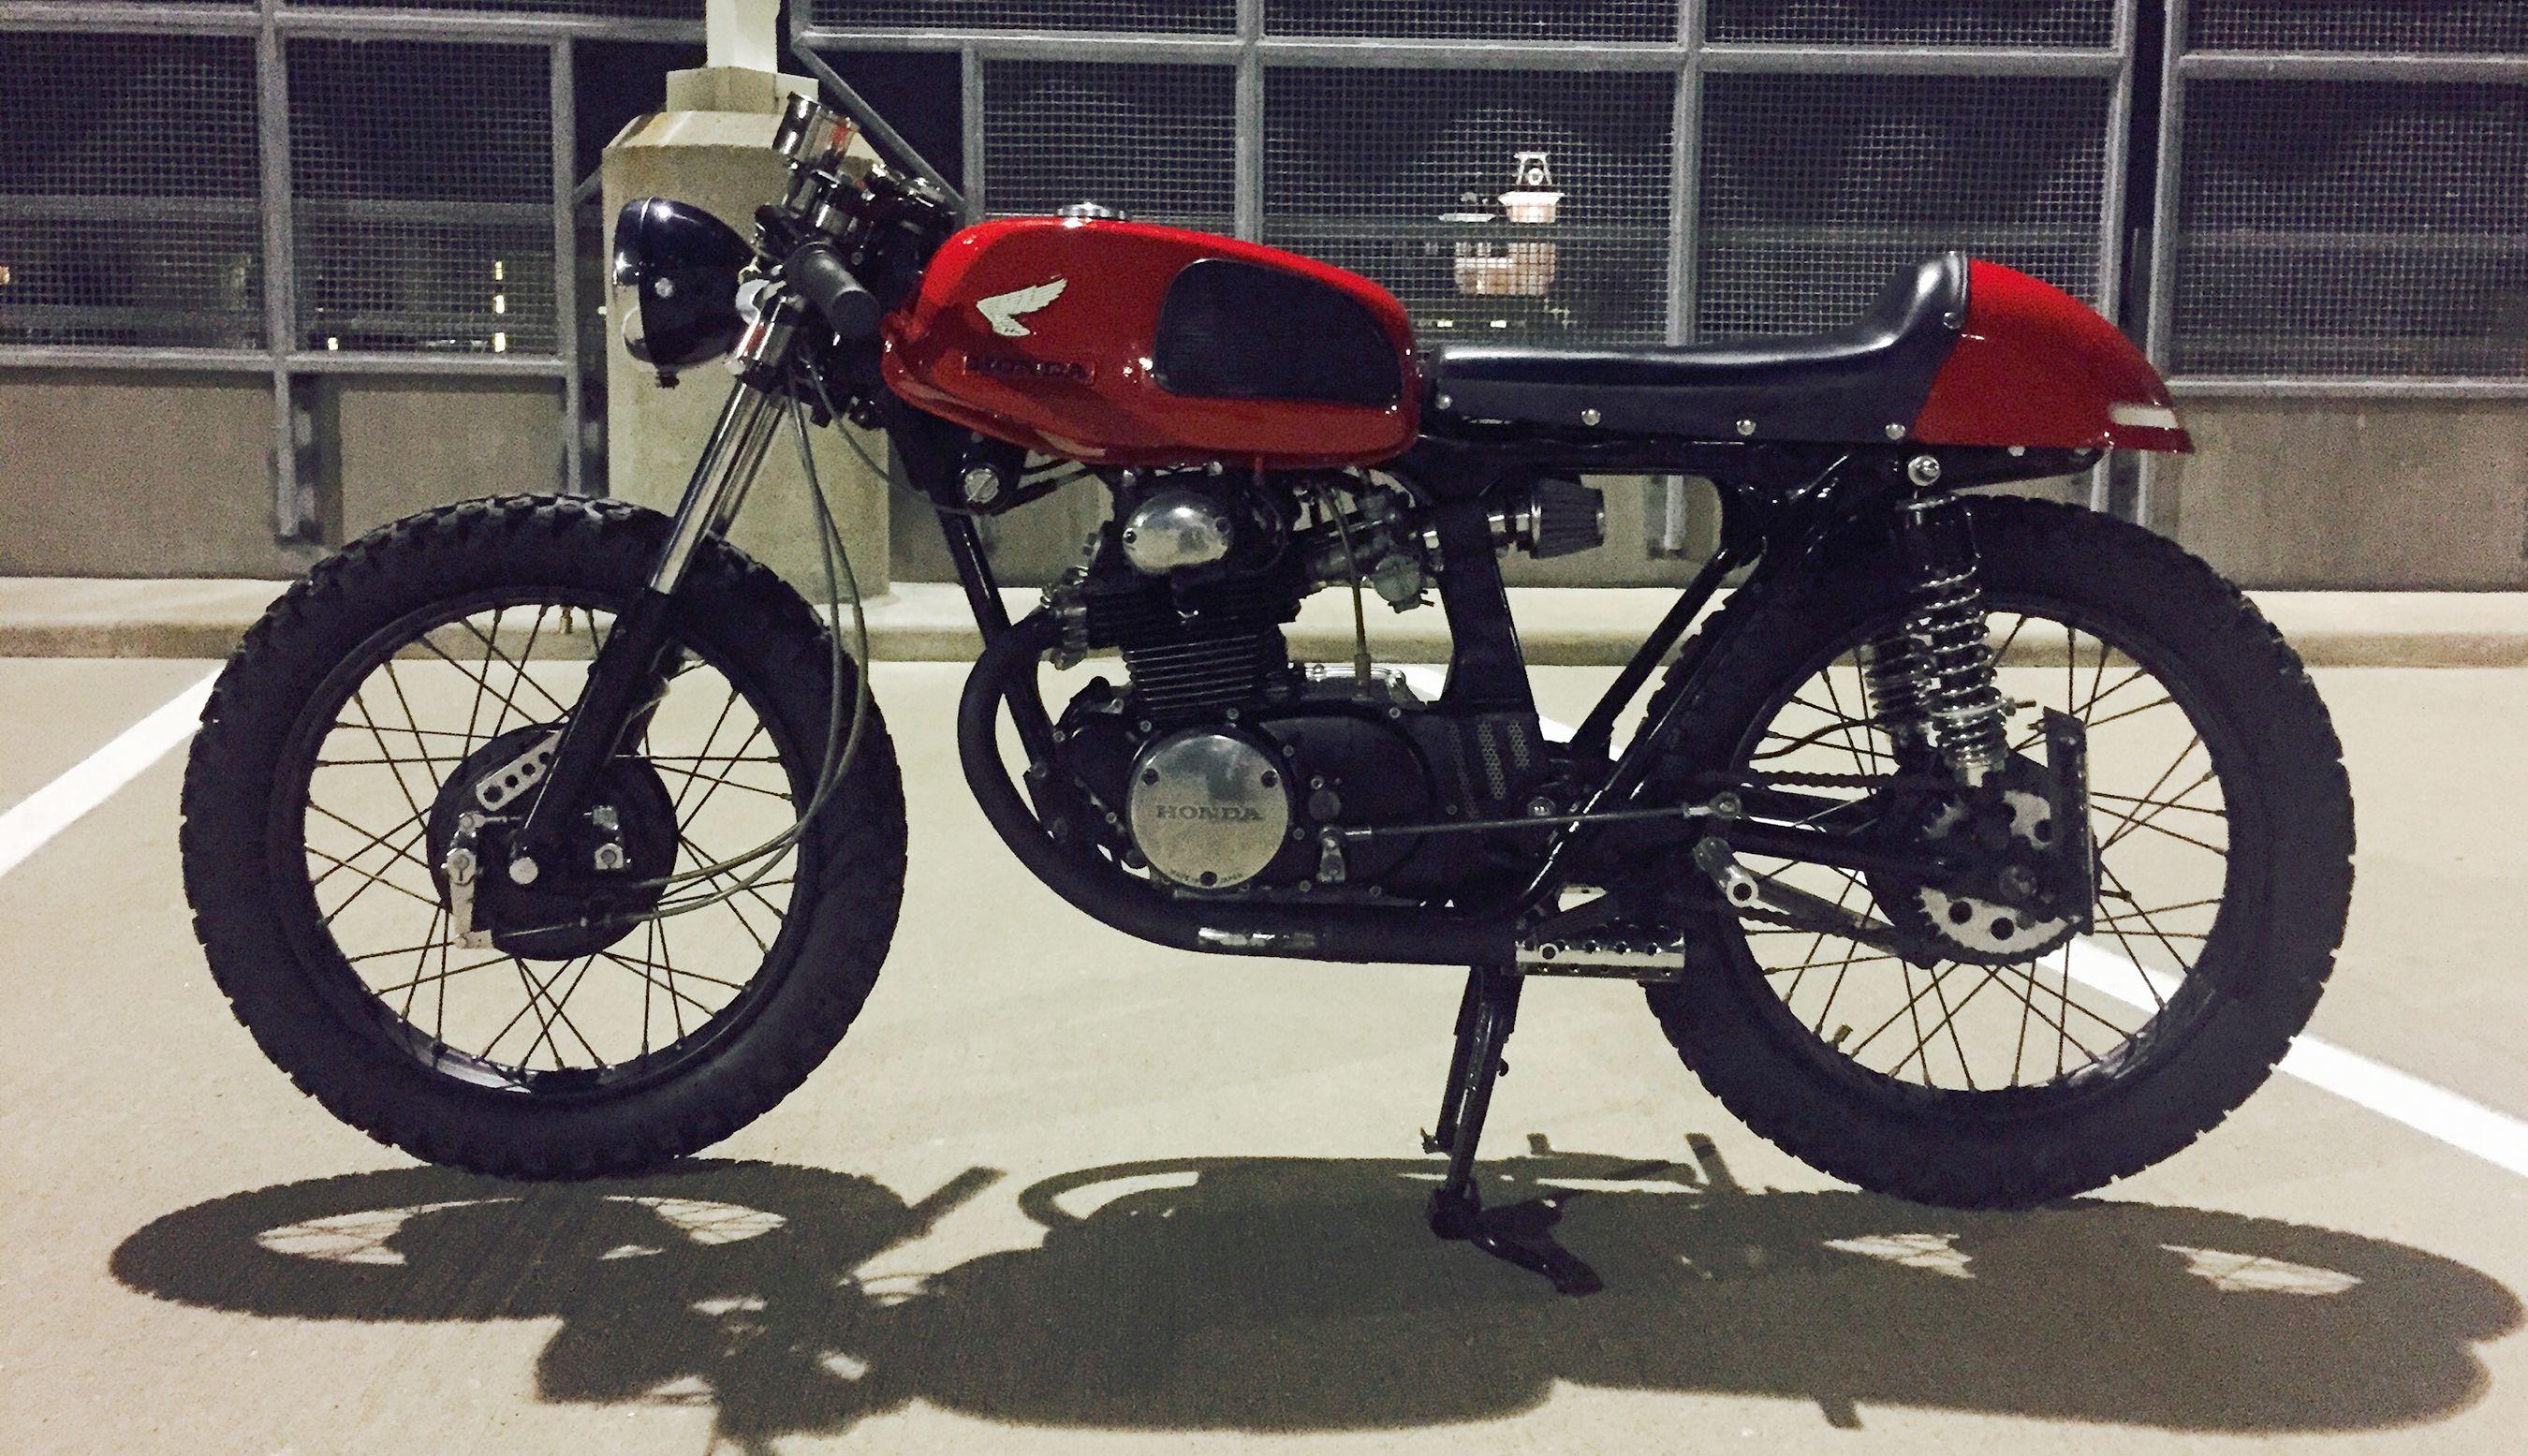 My 1972 Honda Cb175 Cafe Racer Moxxi Hot Bikes Cafe Racer Vintage Bikes [ 1555 x 2700 Pixel ]